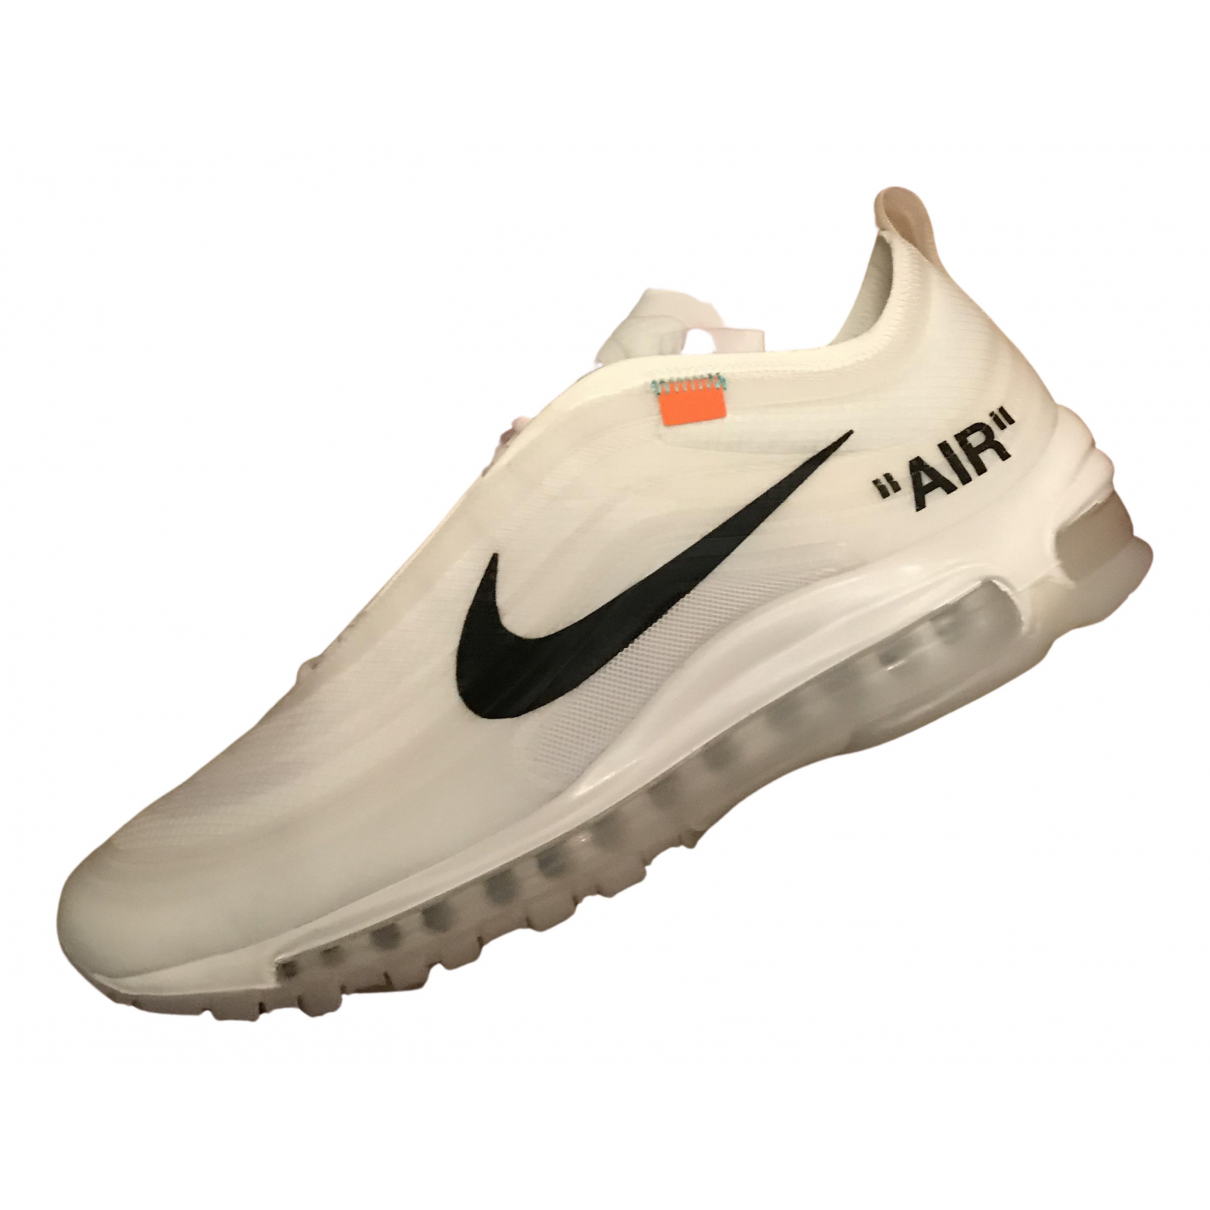 Nike X Off-white - Baskets Air max 97 pour homme - blanc